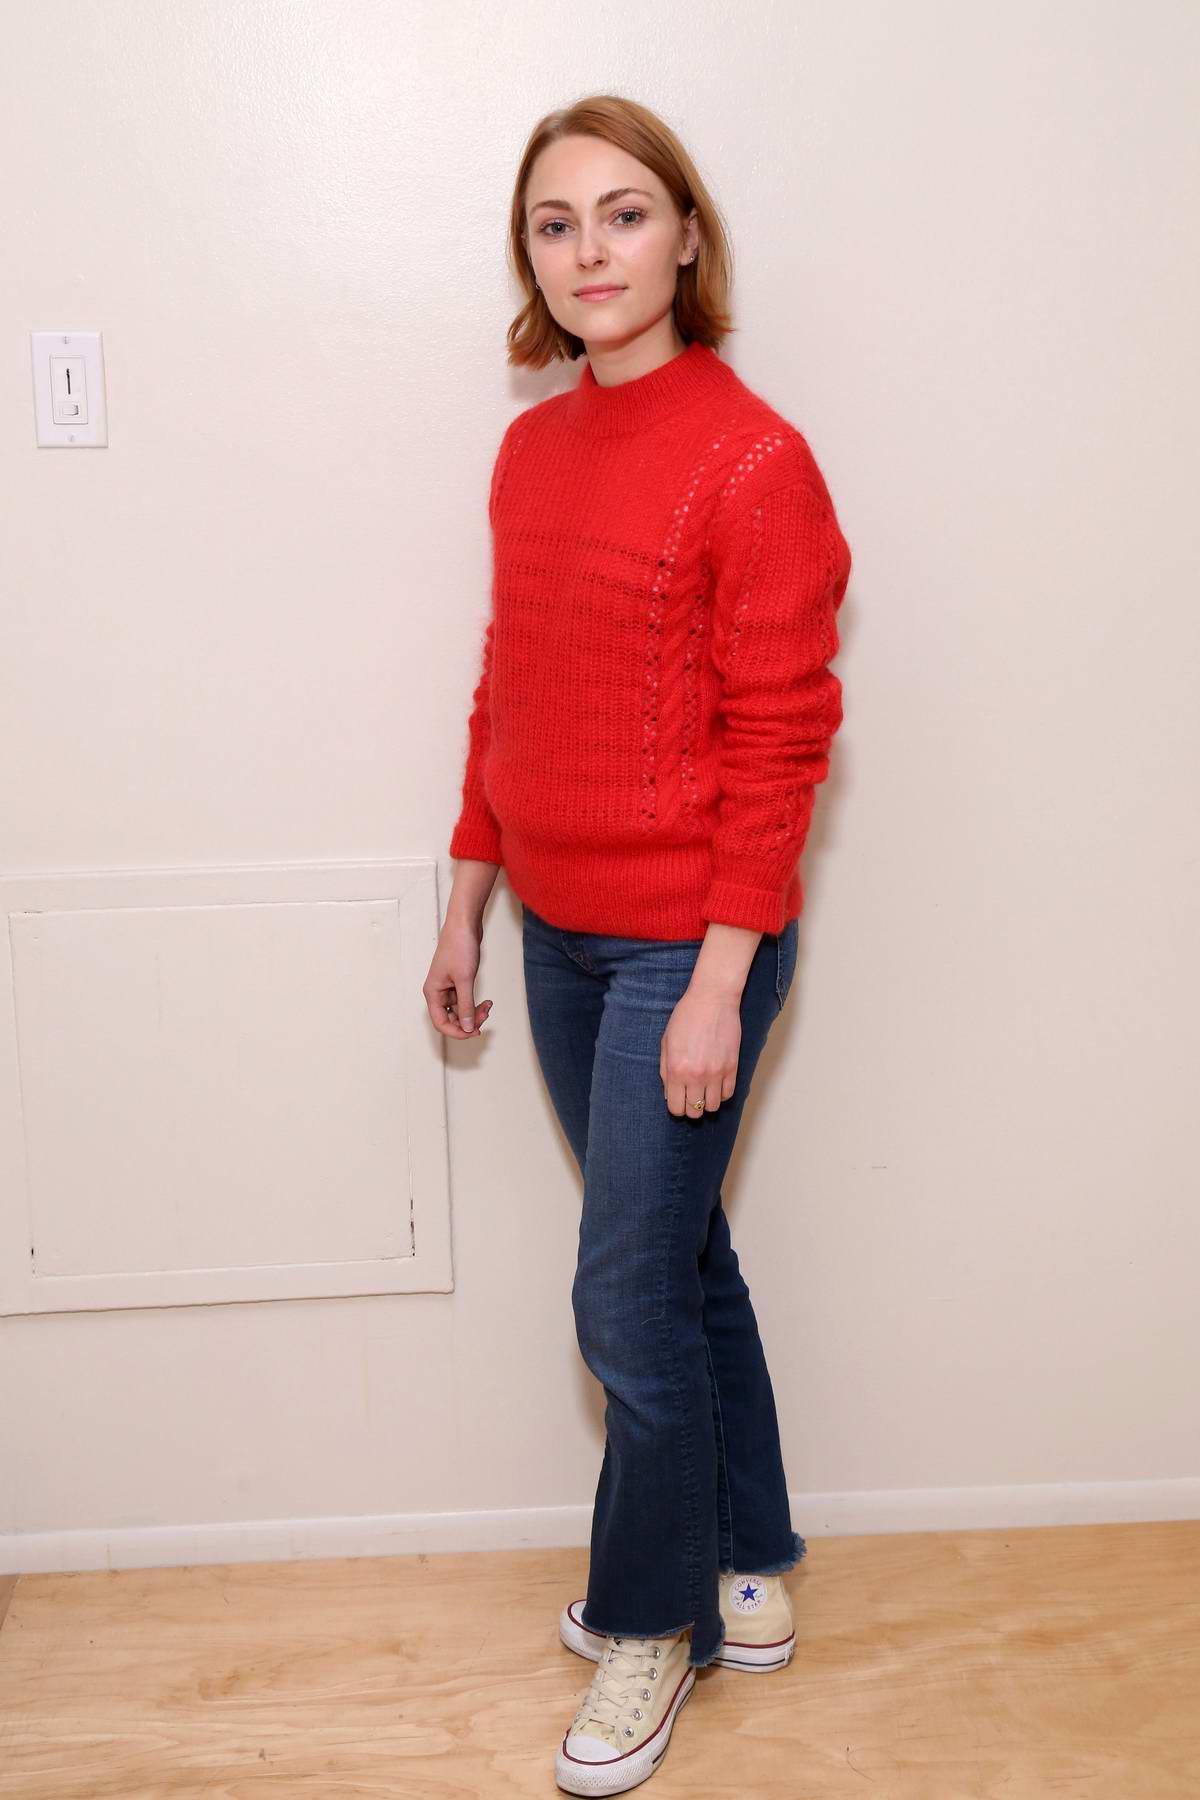 AnnaSophia Robb attends a Photocall All-Female Cast of Mac Beth in New York City